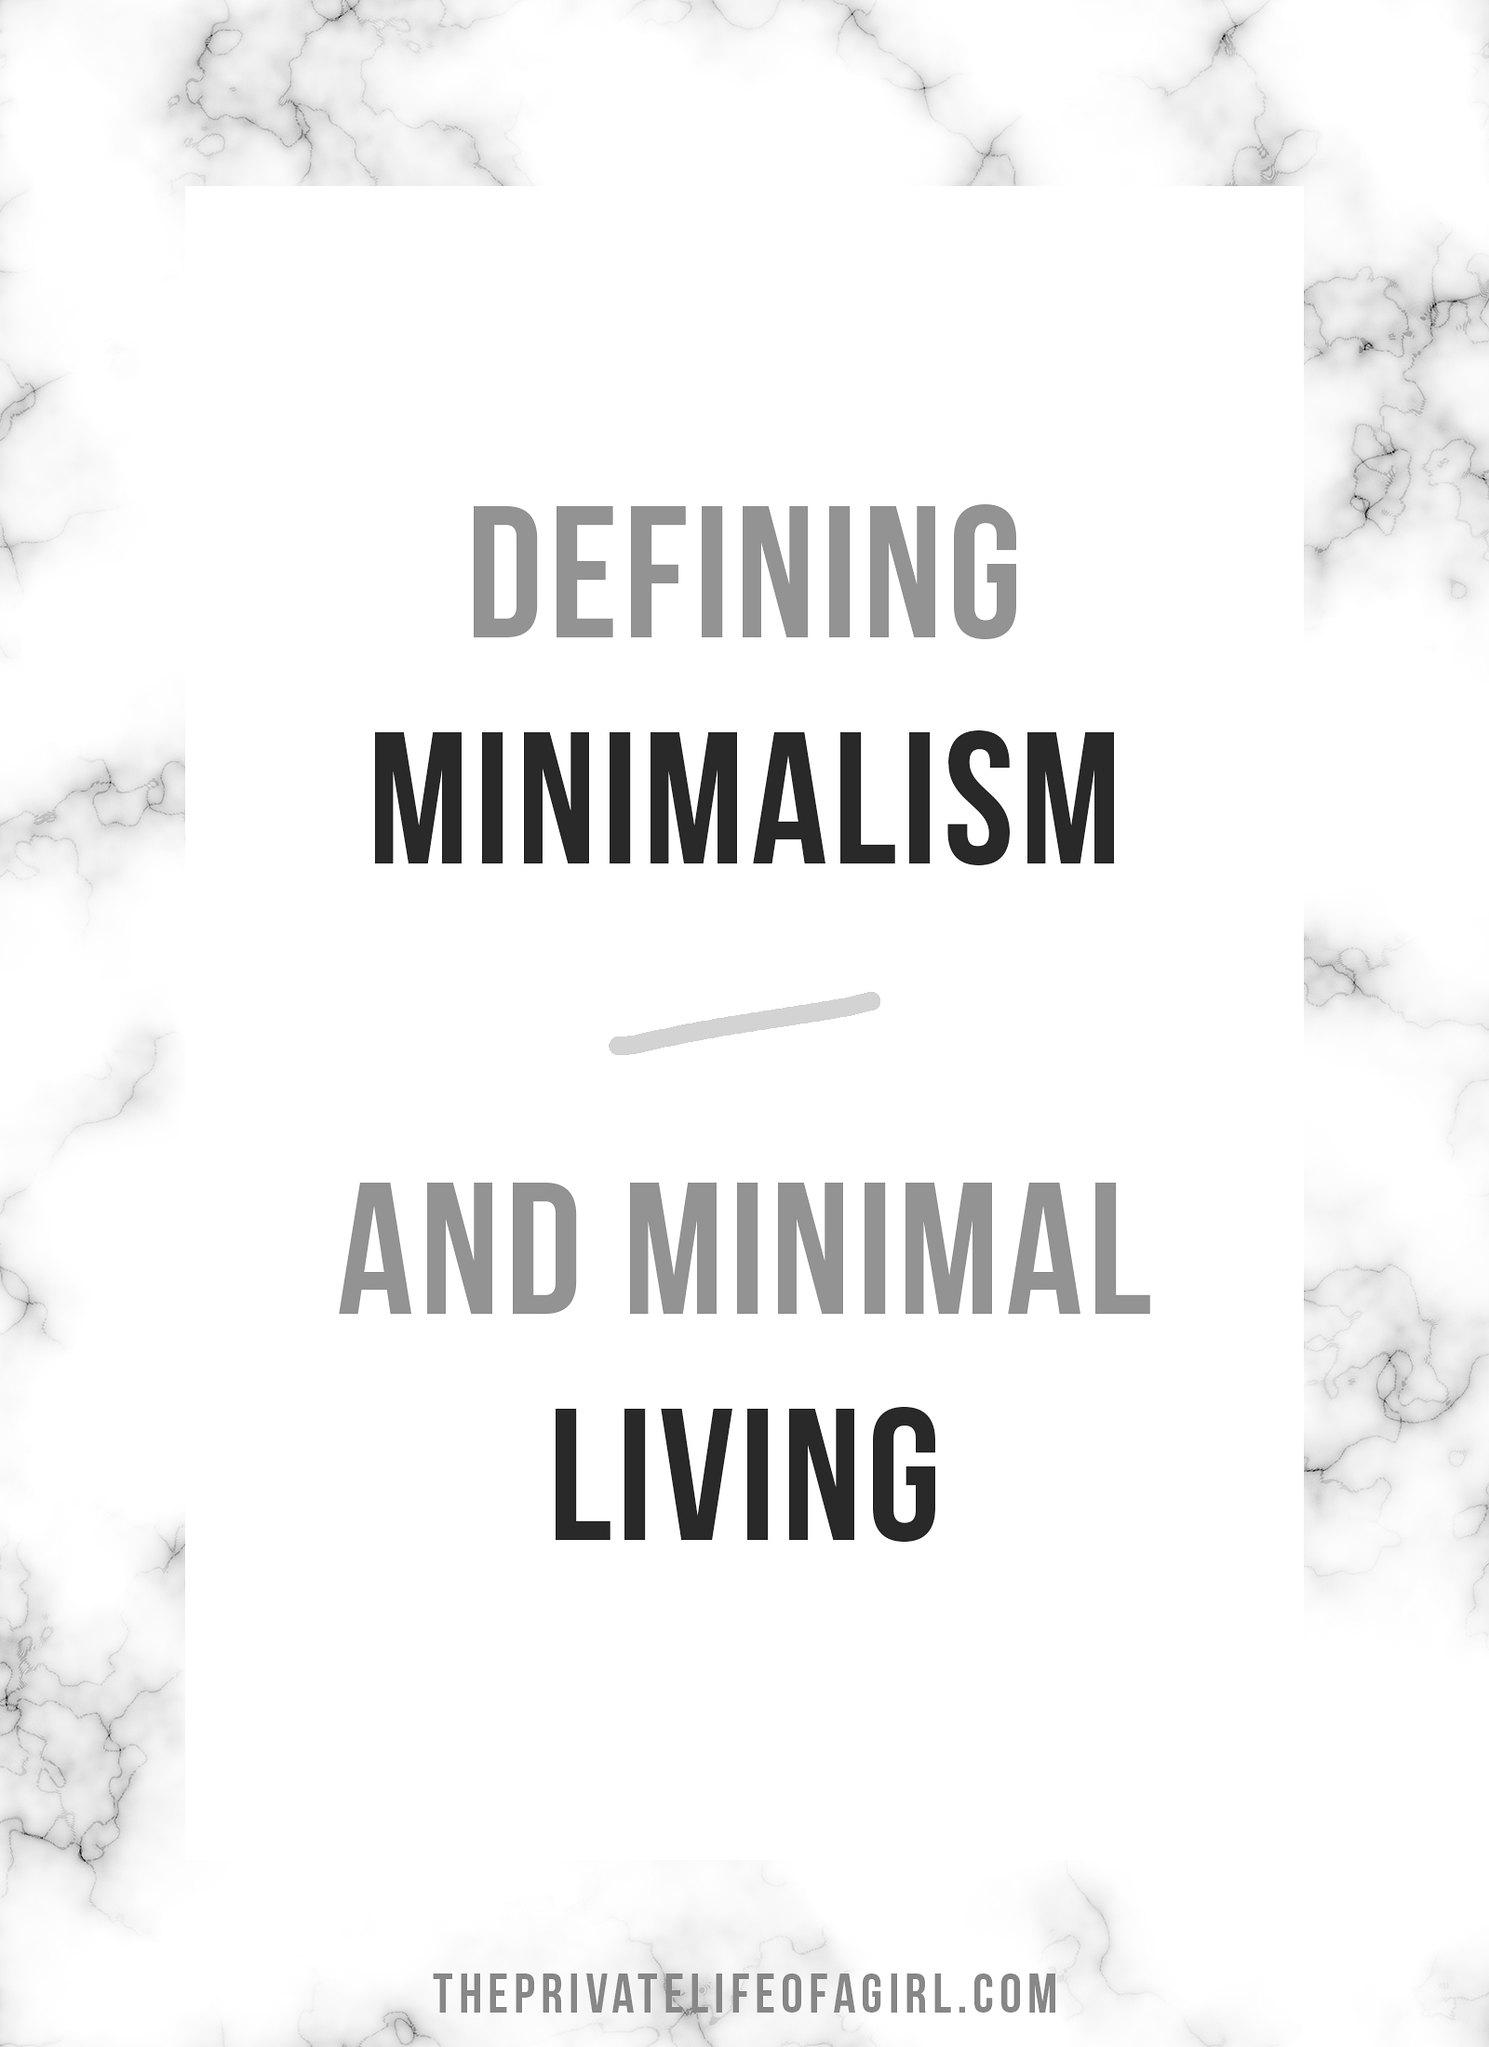 Defining Minimalism and Minimal Living